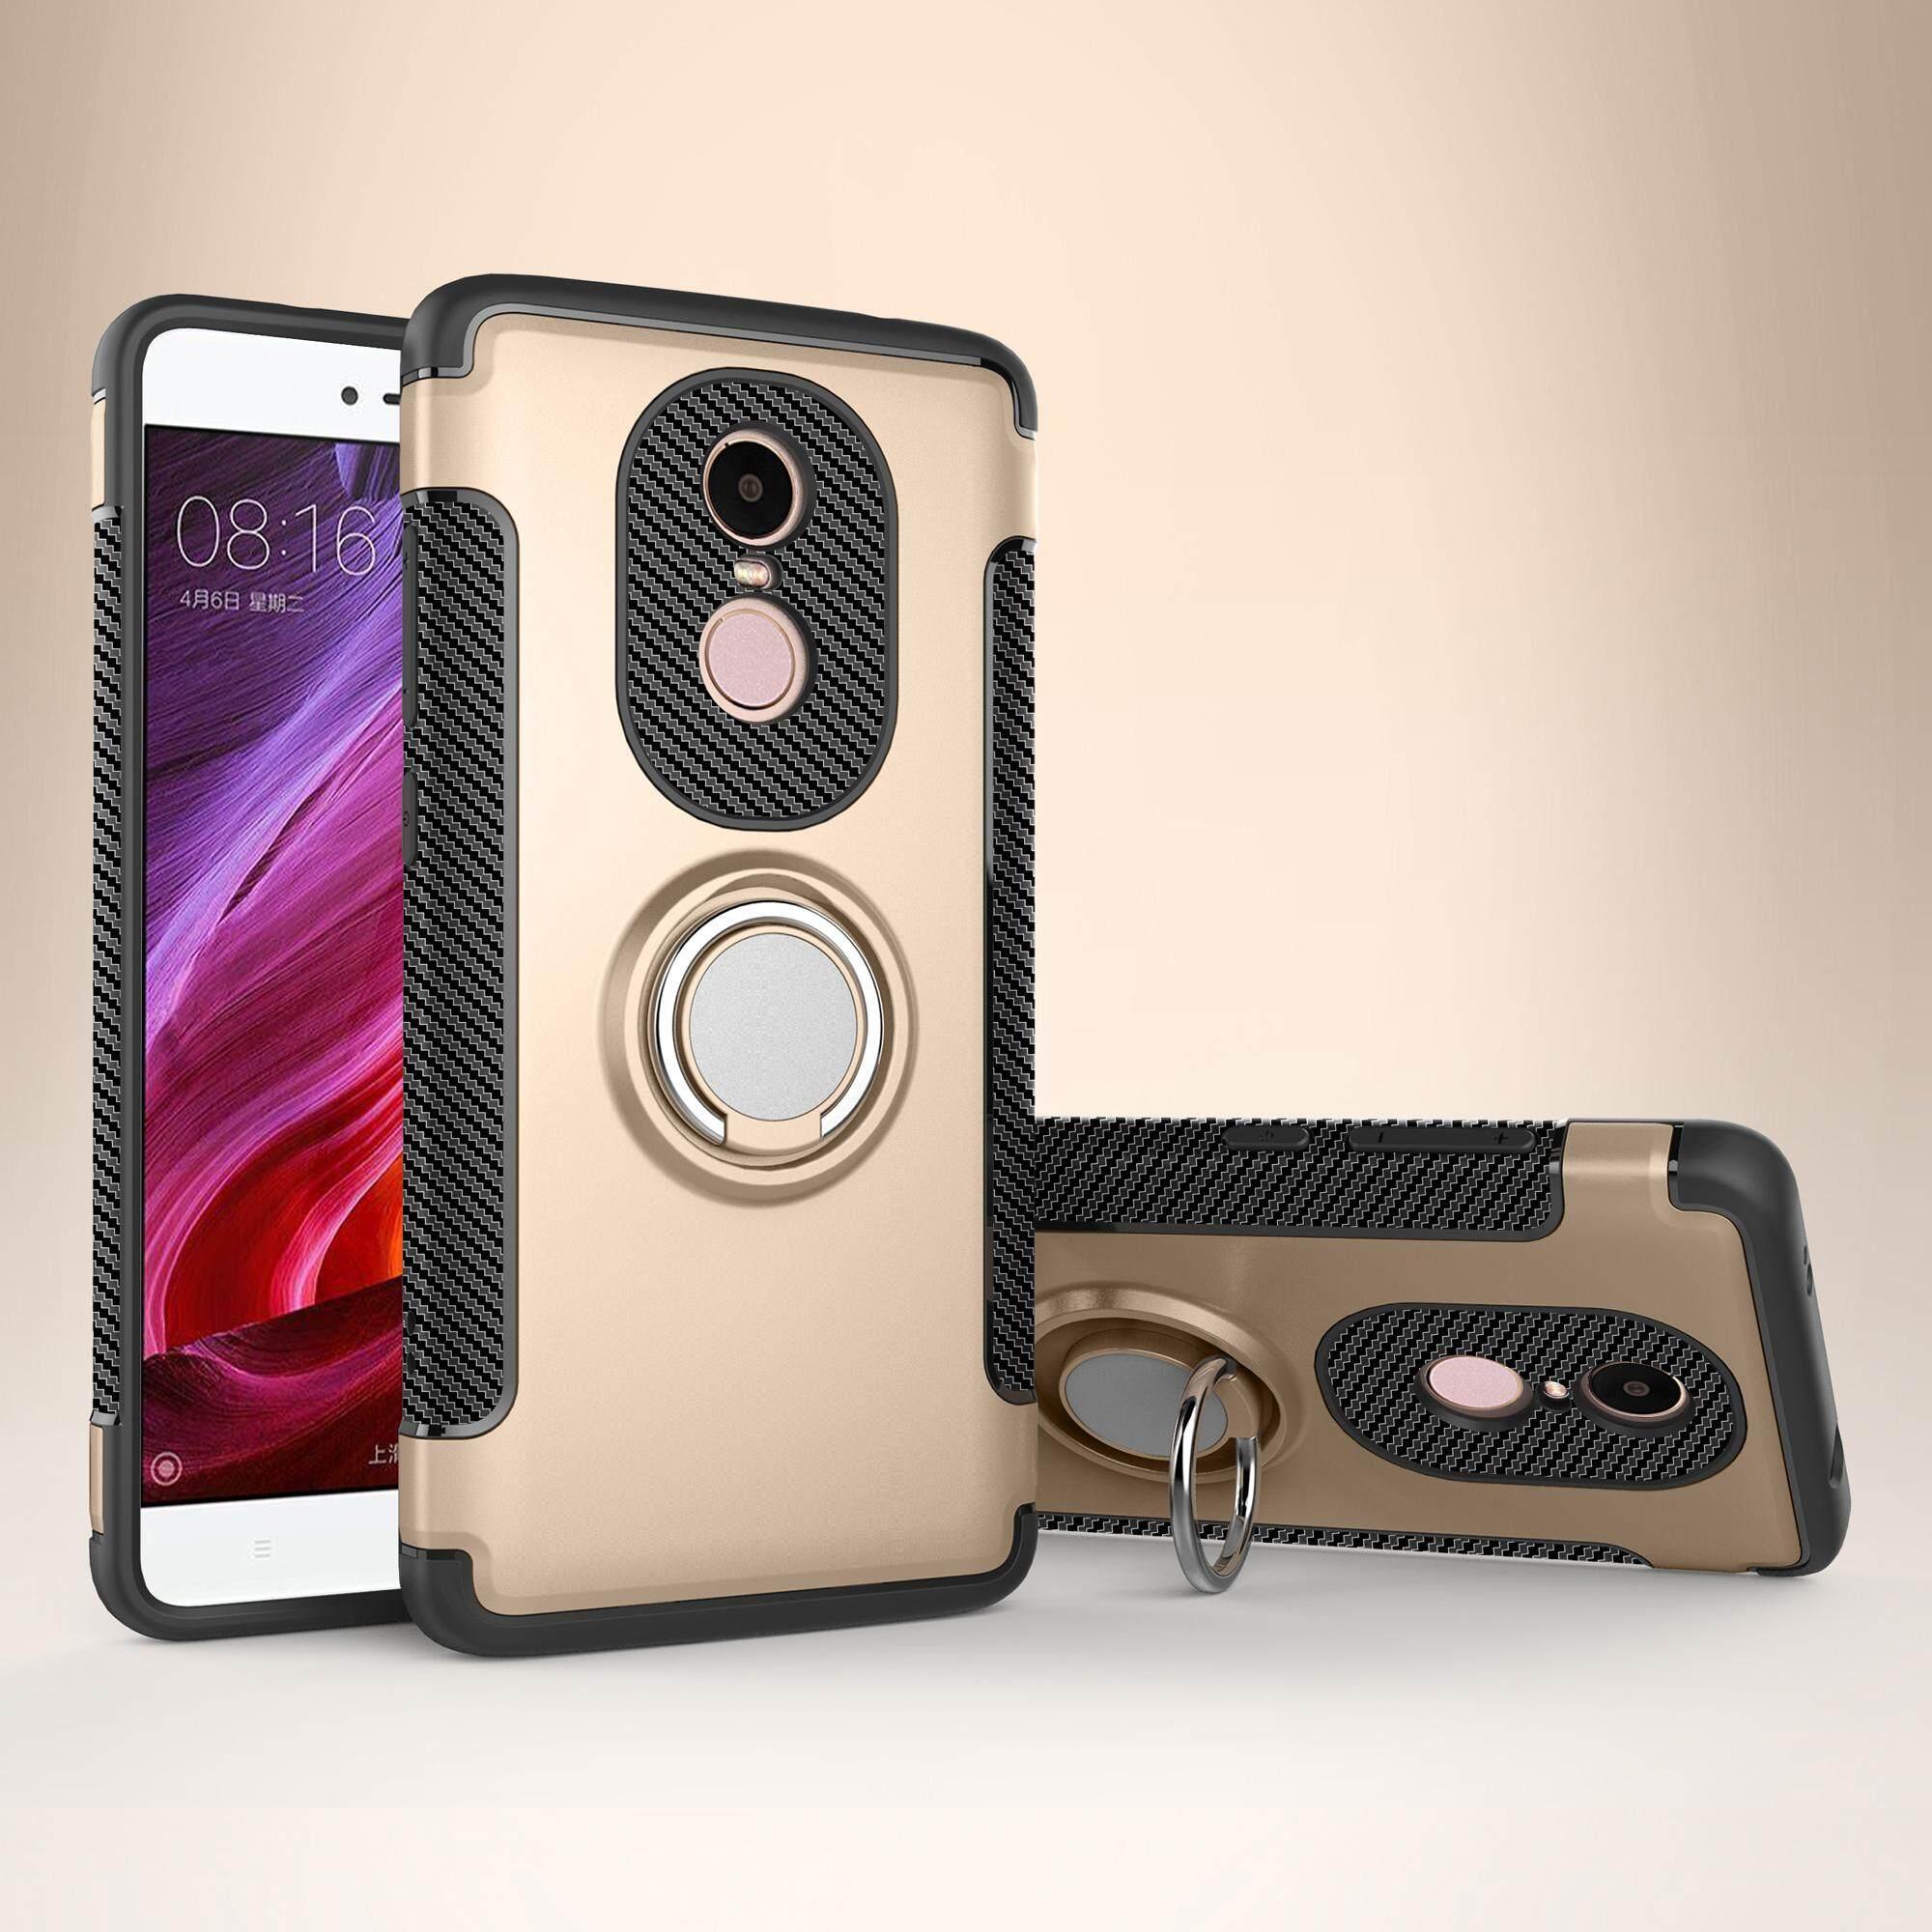 Lingkup Weaver Picatinny Carbon Fiber Tekstur Tpu Pc Combo Cangkang Pelindung Ponsel untuk Xiaomi Redmi Note